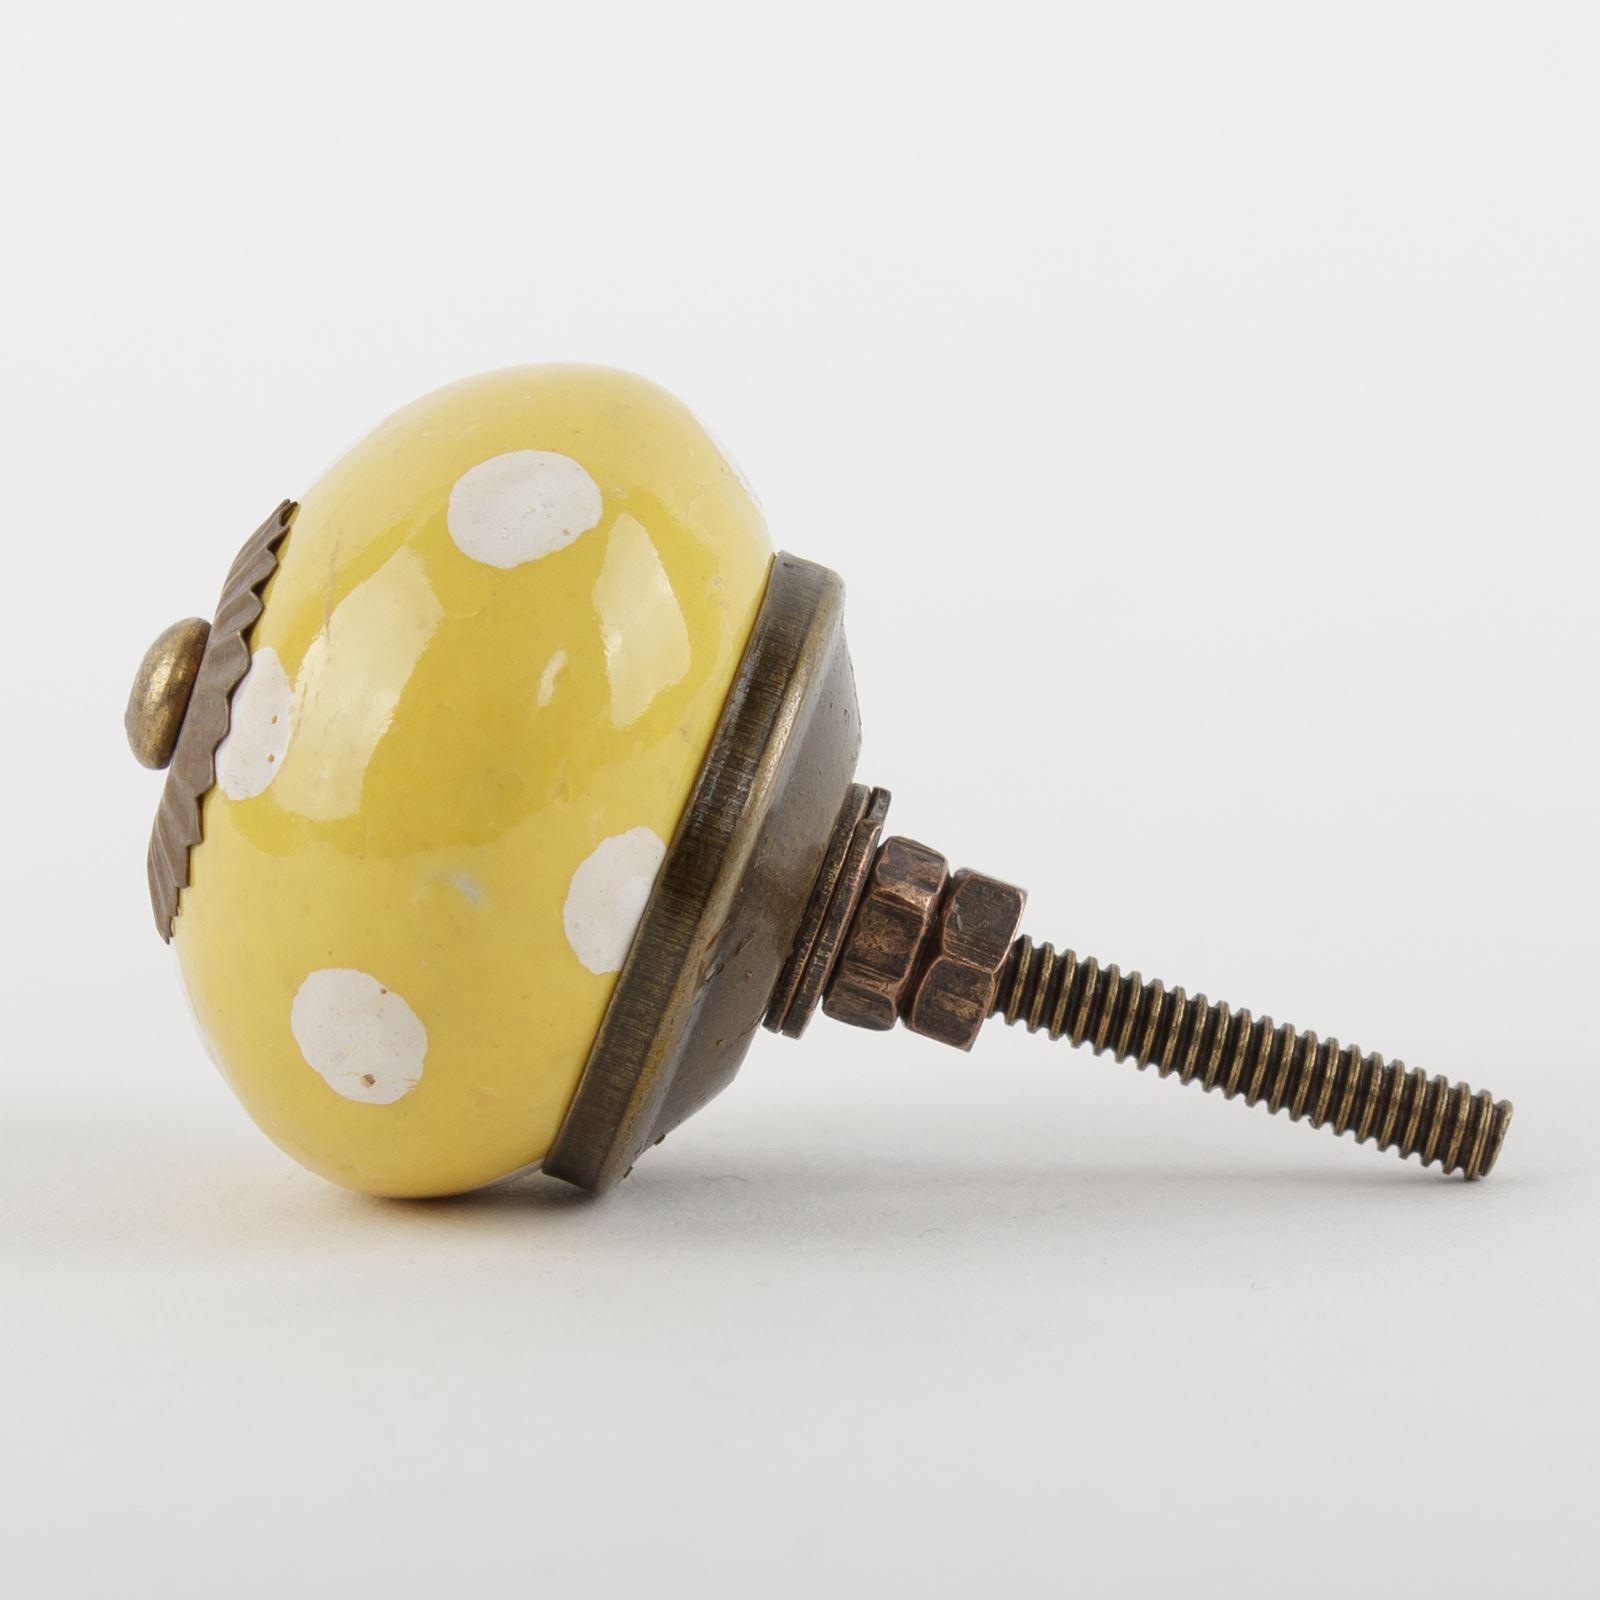 Dots-amp-Stripes-Ceramic-Door-Knobs-Handles-Furniture-Drawer-Pulls-Cupboard miniatura 59